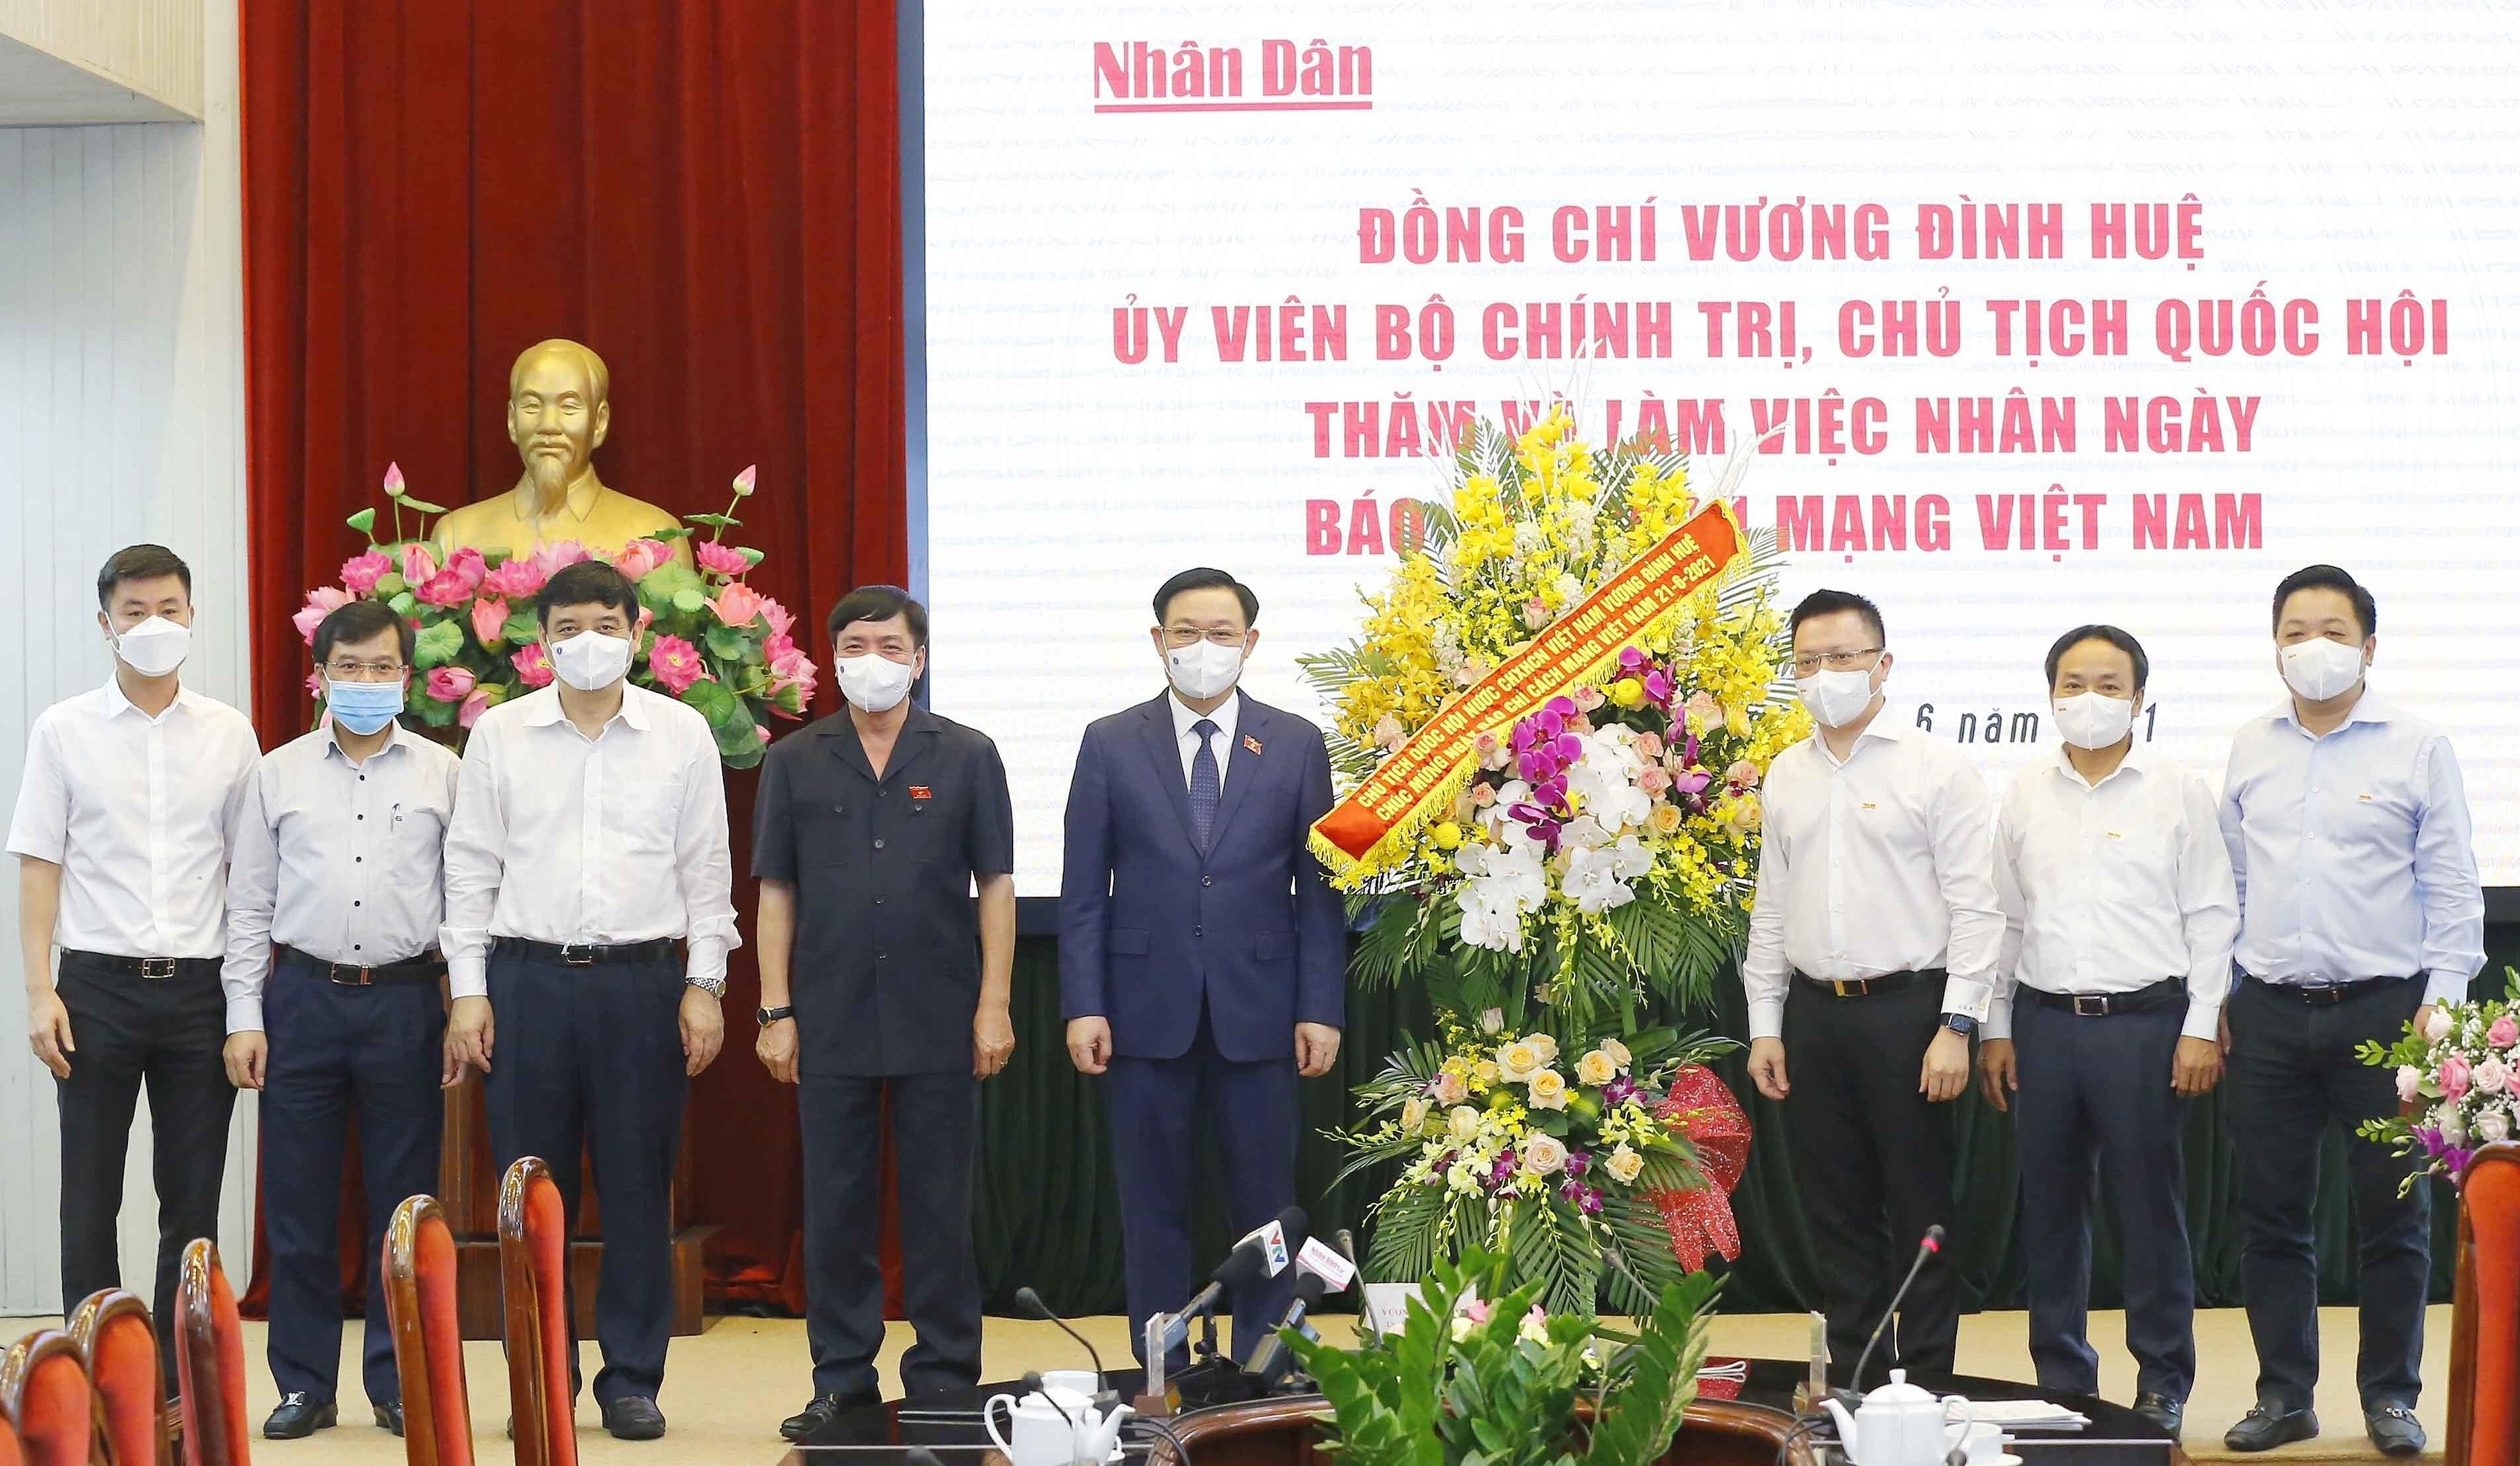 Top legislator visits news outlets on Revolutionary Press Day hinh anh 1